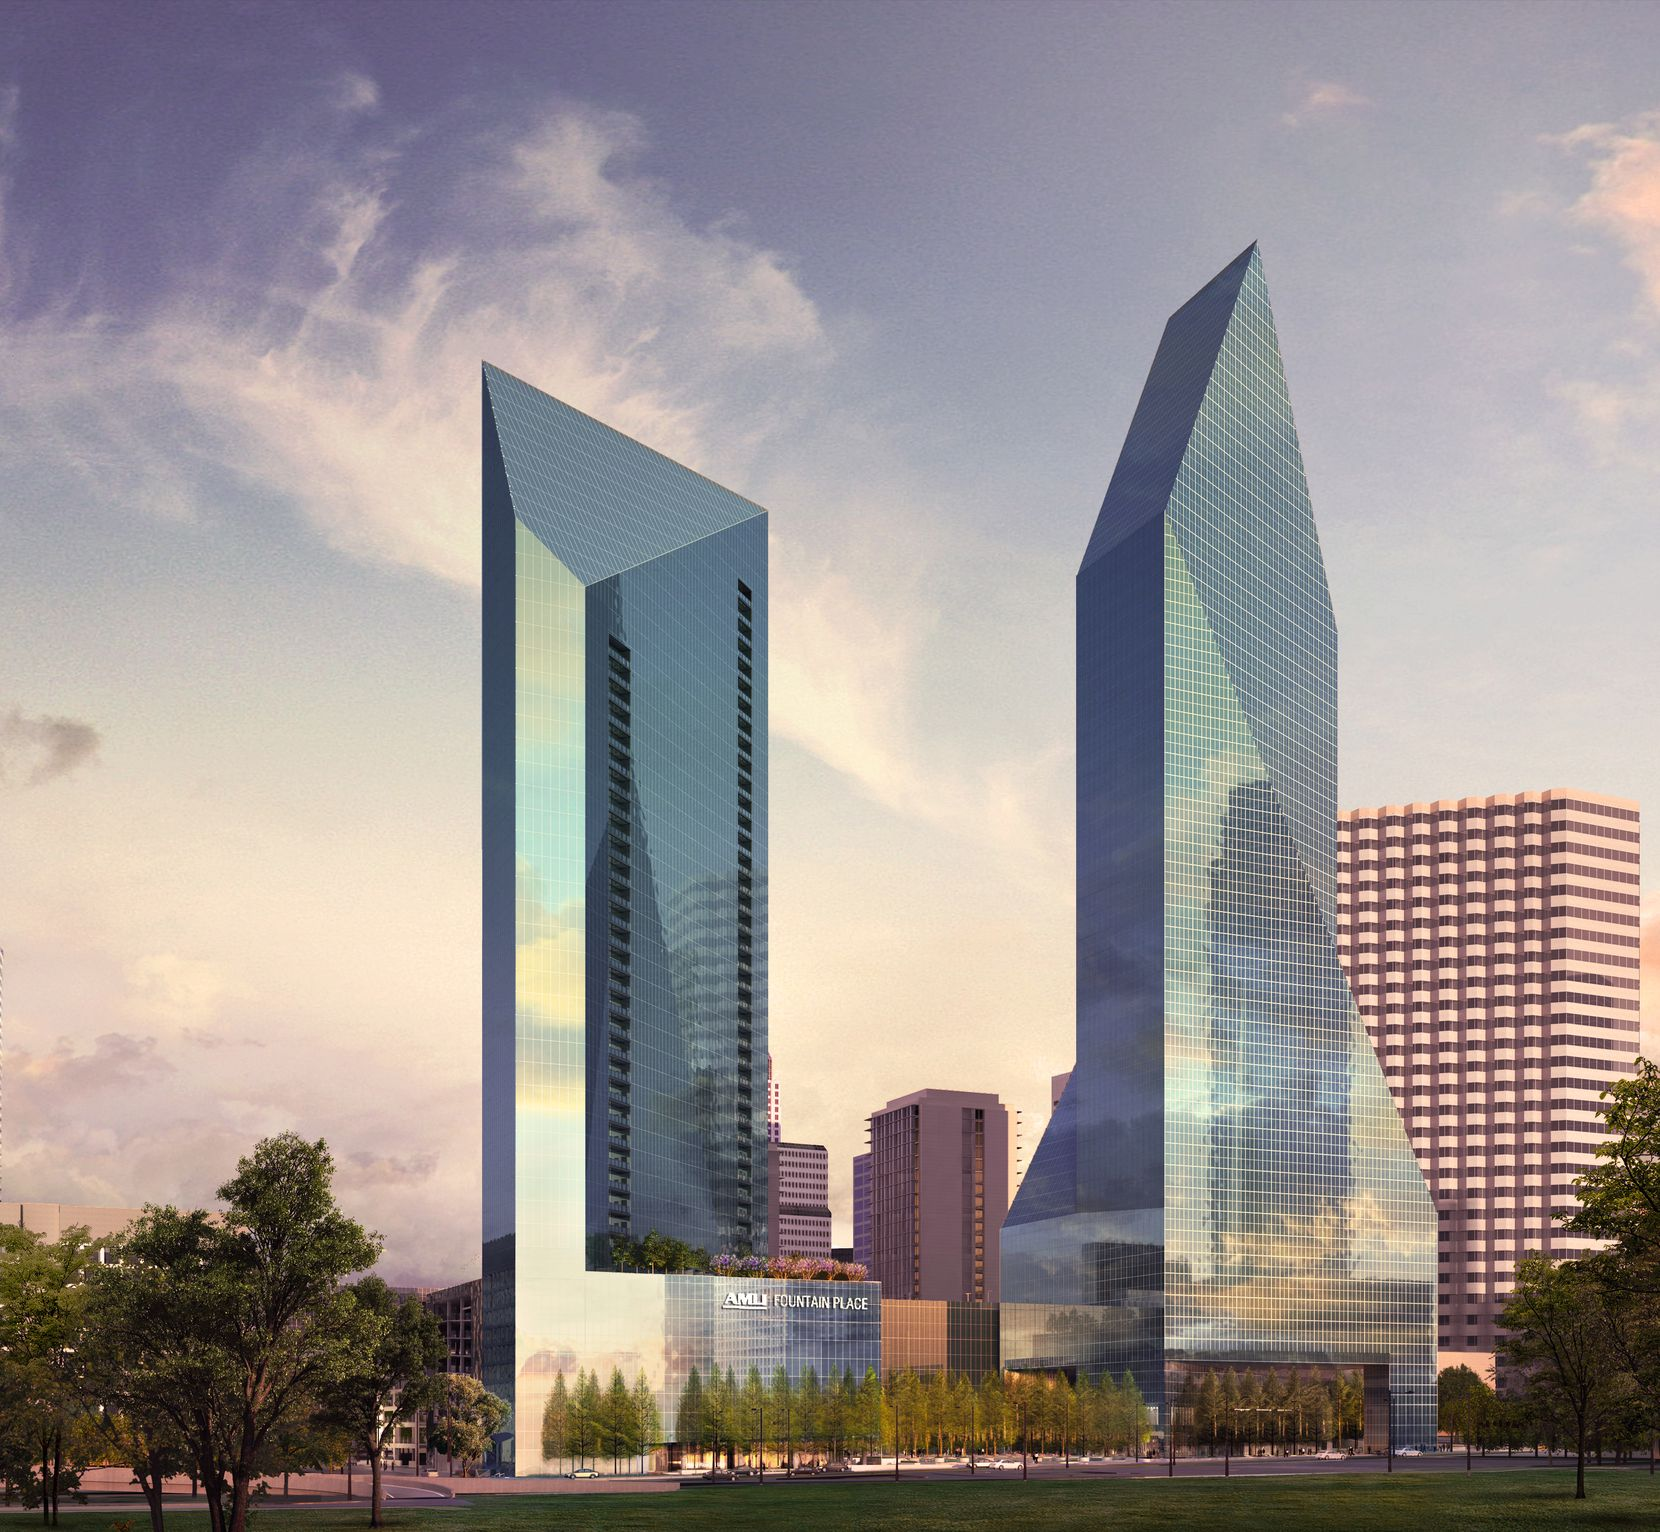 Striking new skyscraper in downtown Dallas will be tallest in decades